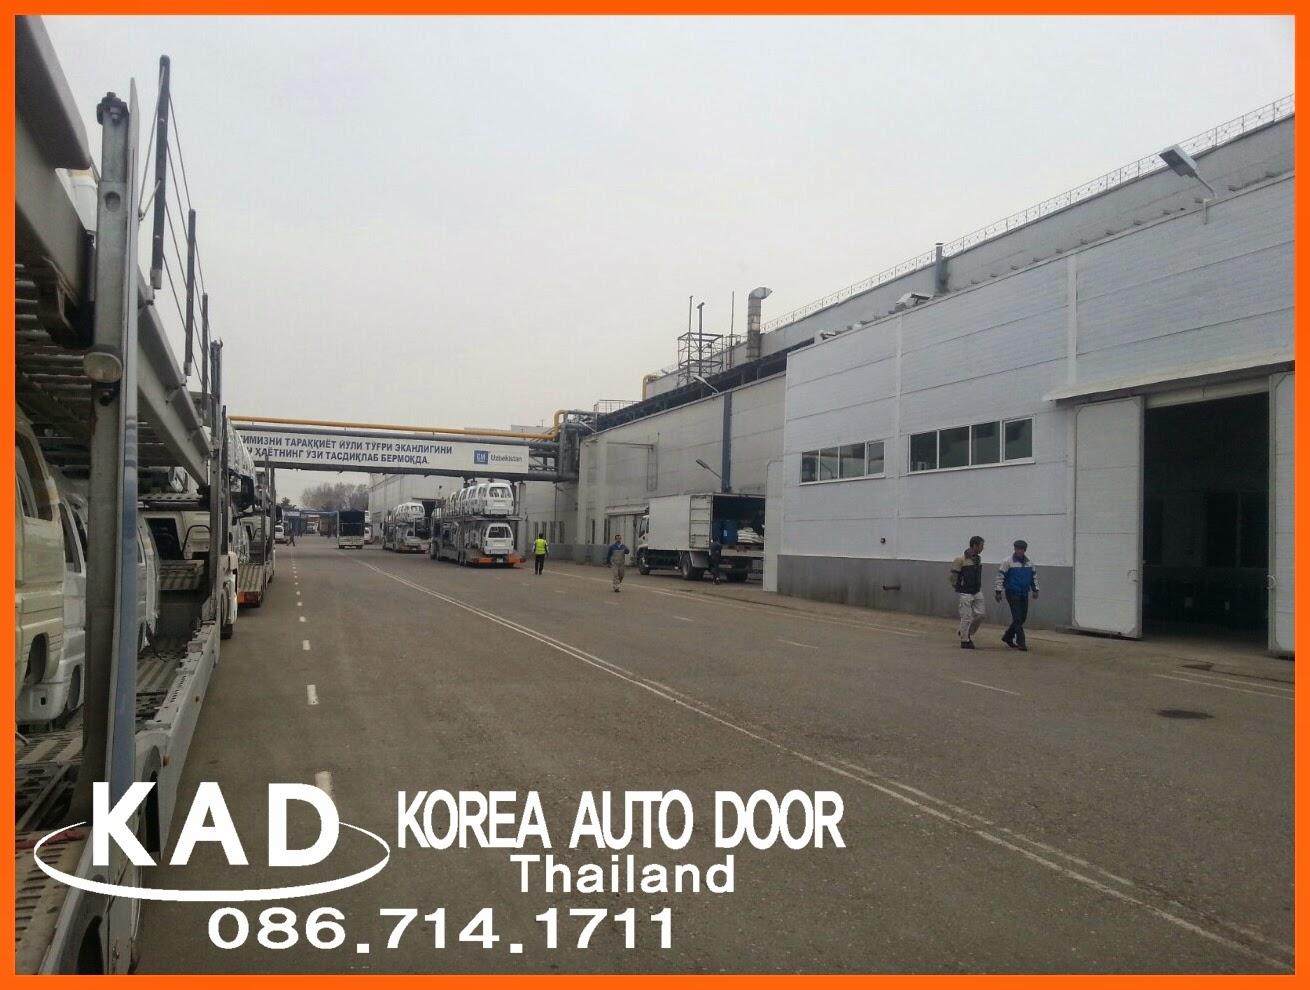 high speed door is ประตูอุตสาหกรรม